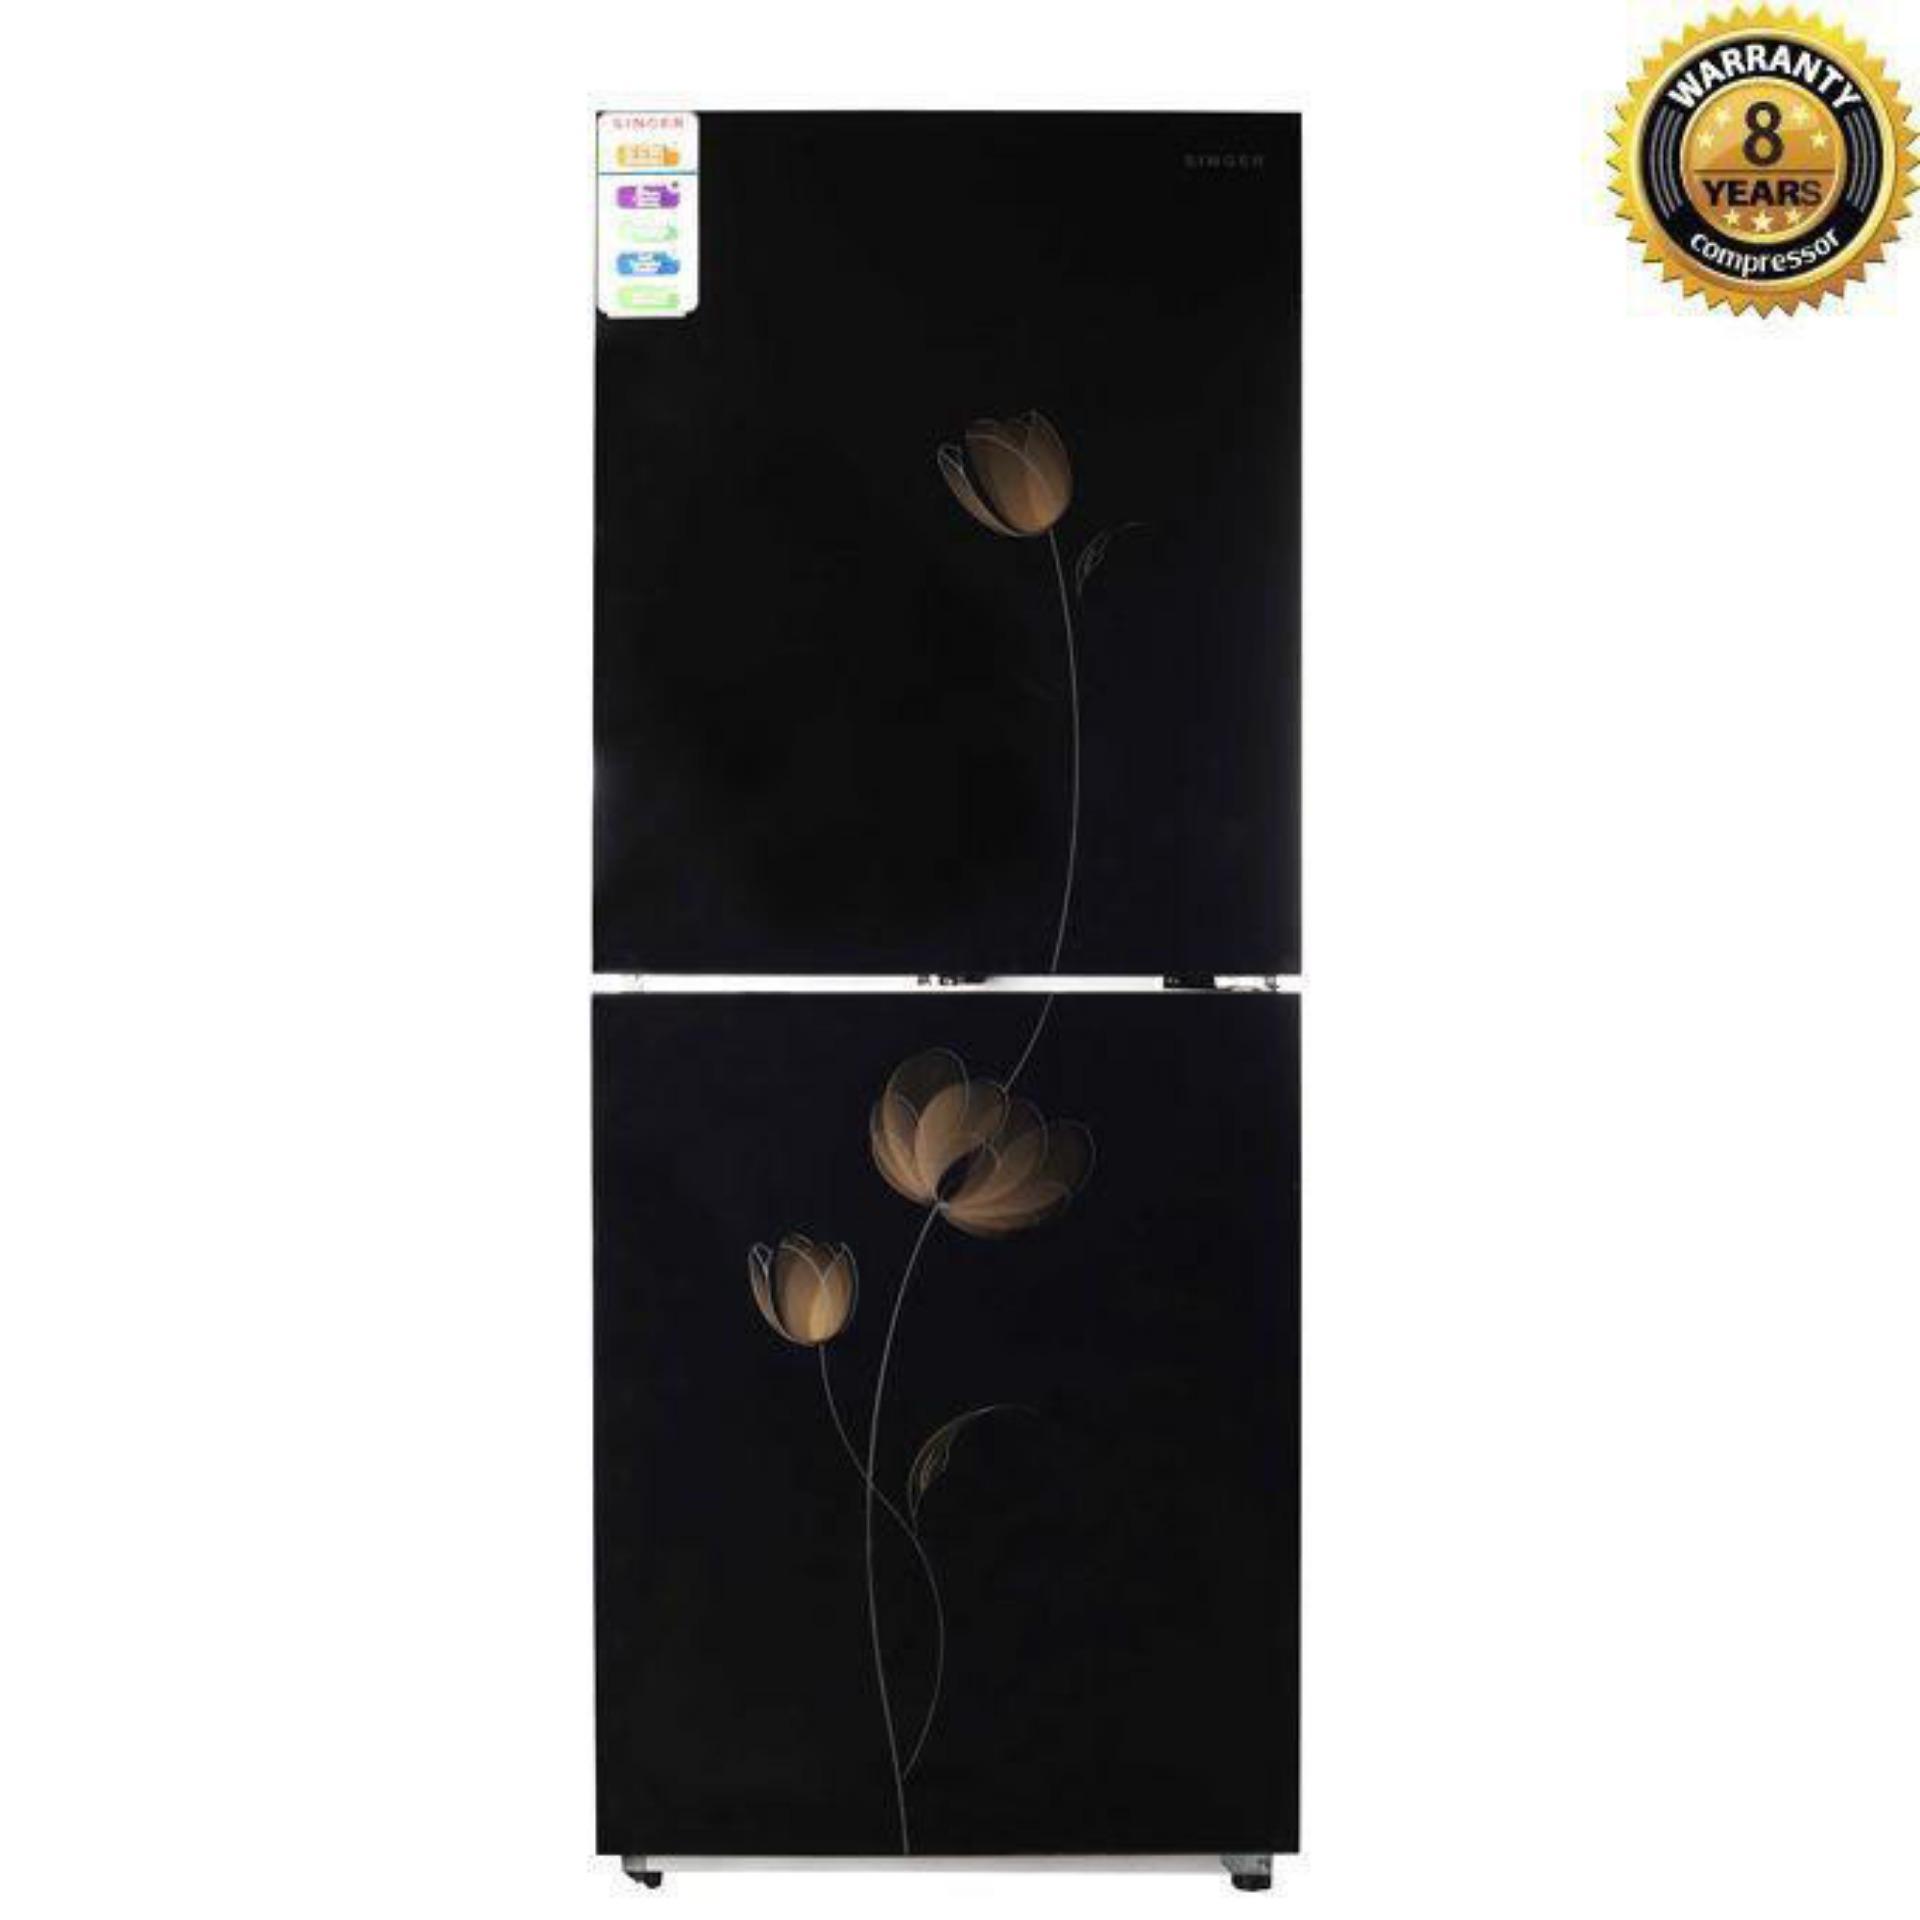 G-BCD-290 Top Mount Refrigerator 290L - Black